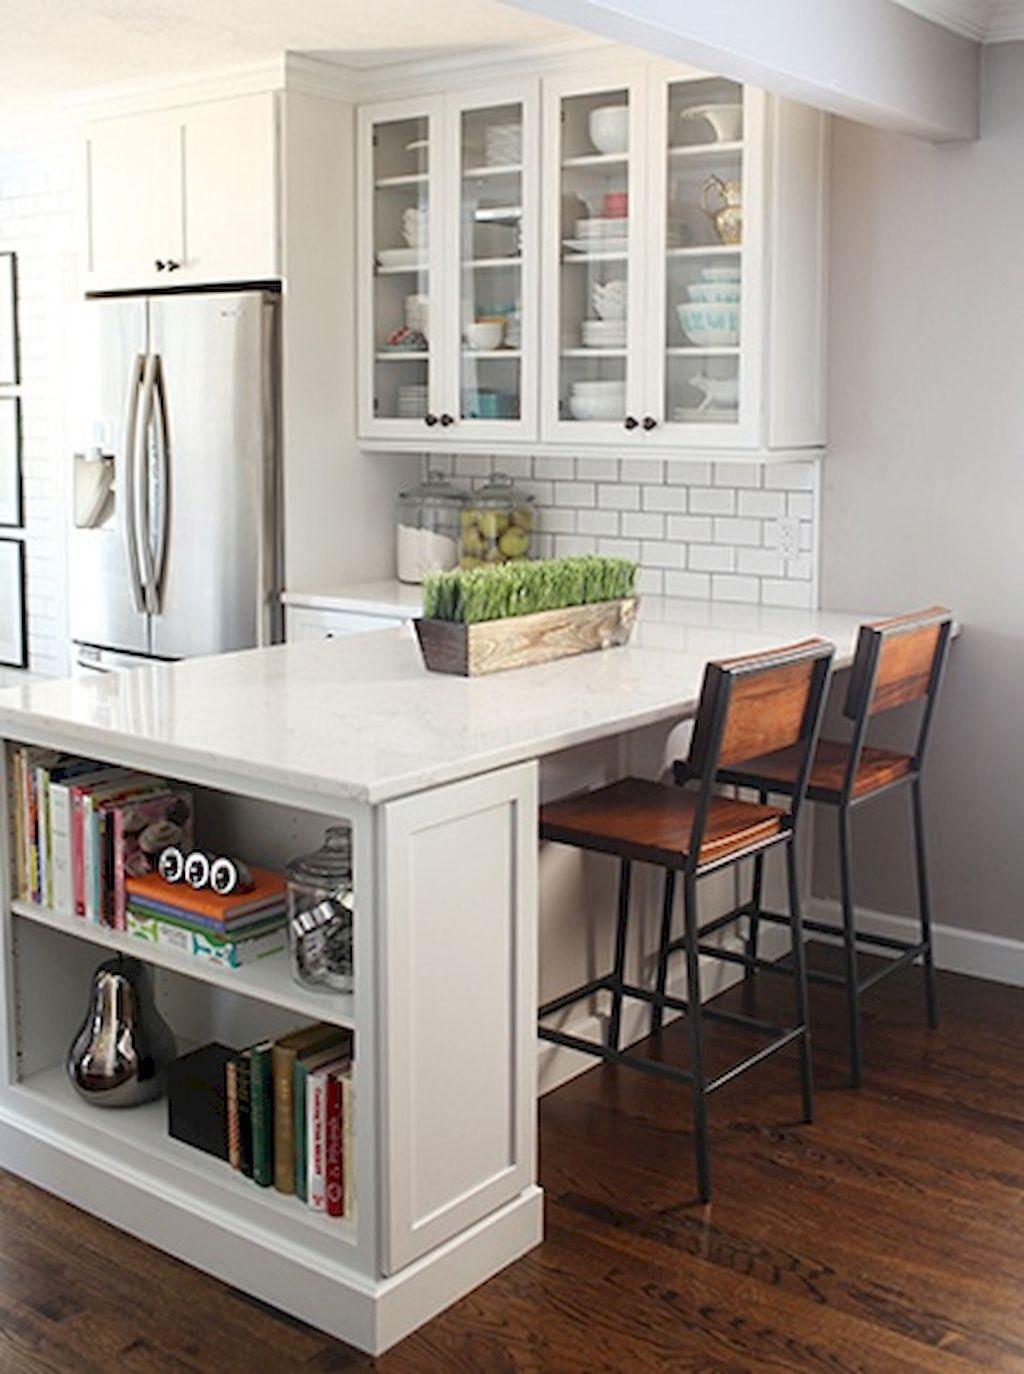 90 Inspiring Small Kitchen Remodel Ideas  Organization Ideas Beauteous Remodeling Kitchen Inspiration